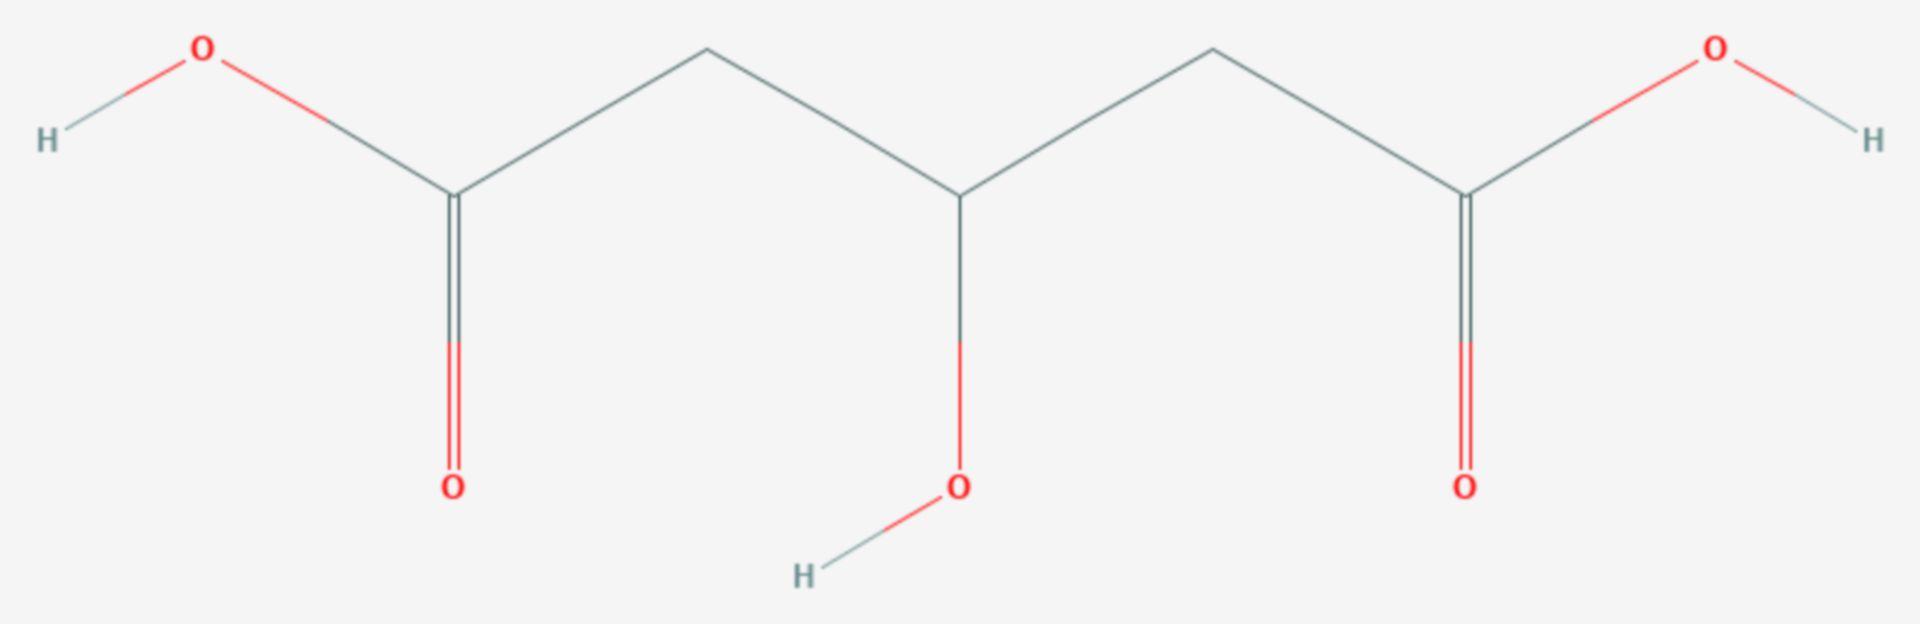 3-Hydroxyglutarsäure (Strukturformel)